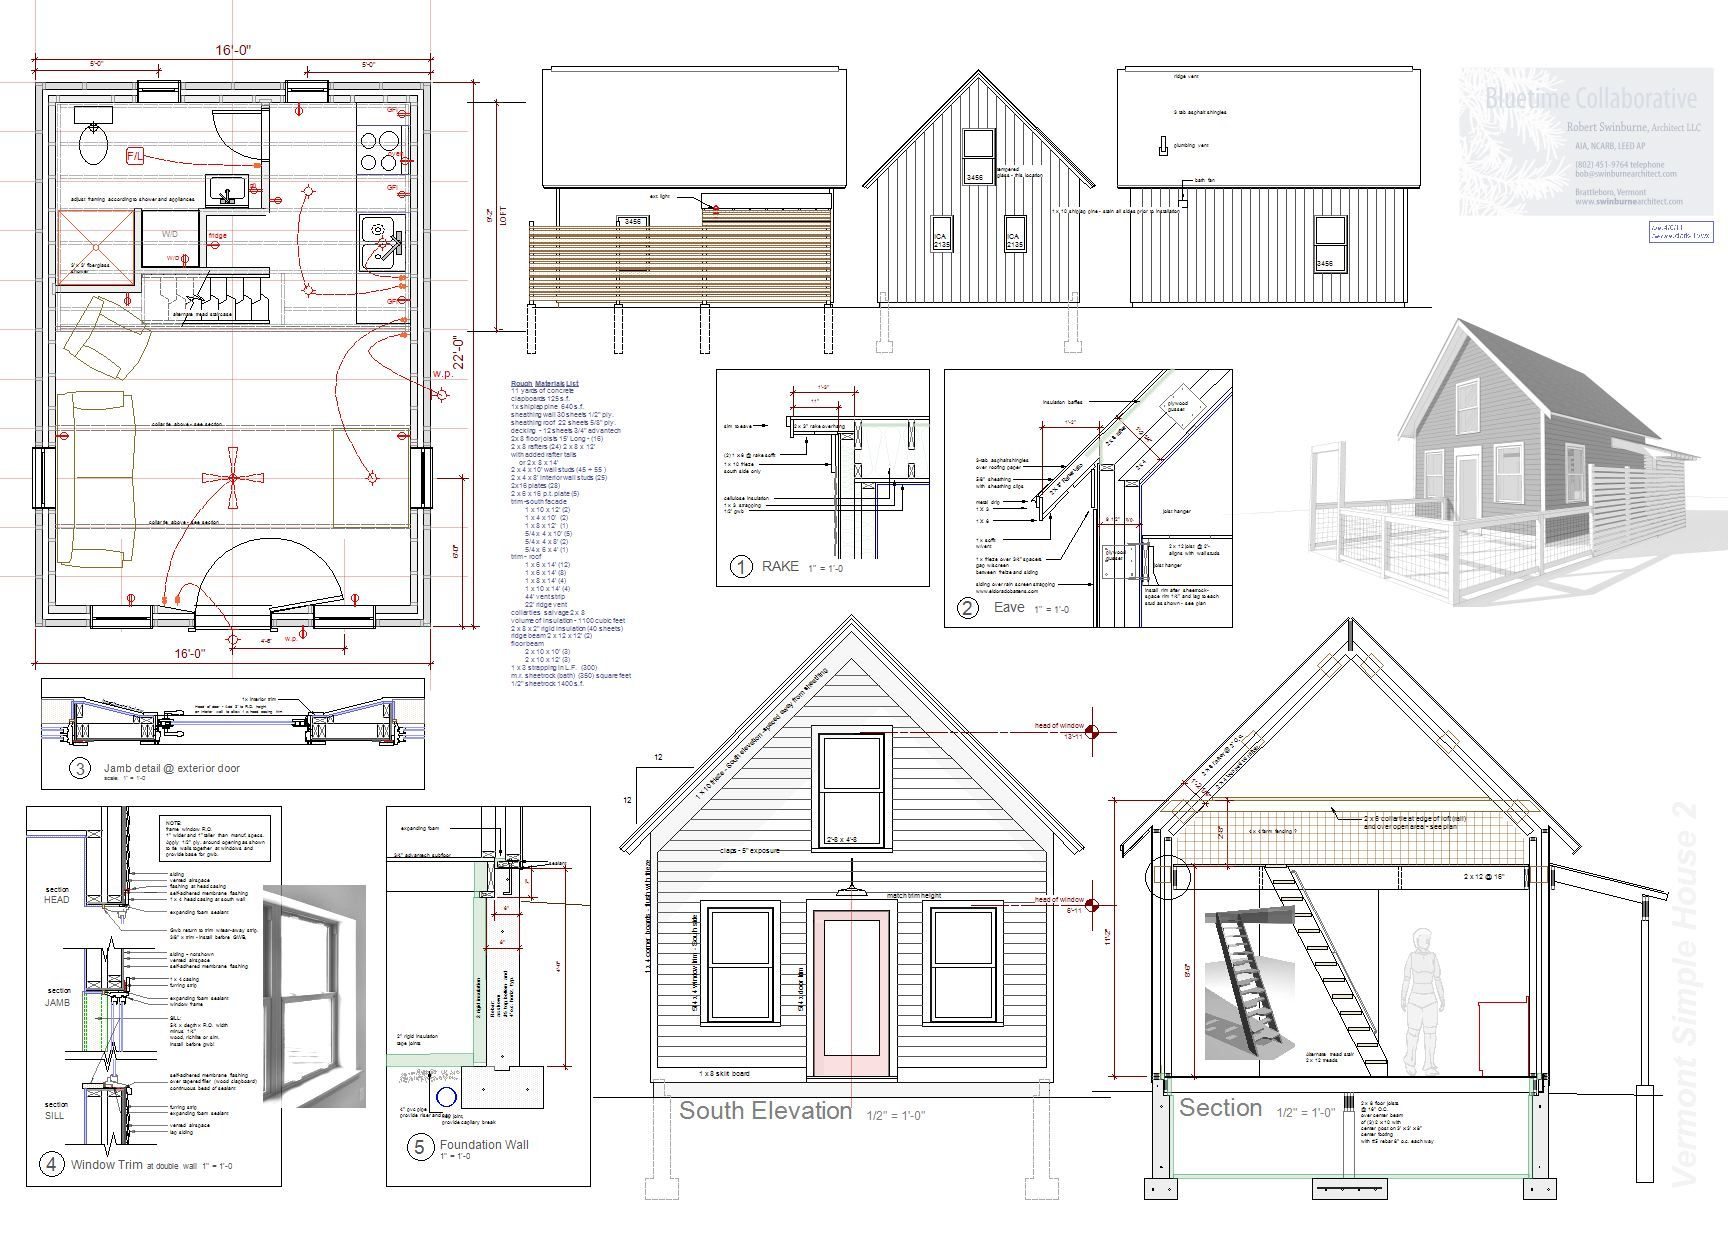 Marvelous 17 Best Images About Tiny House Plans Design Ideas On Pinterest Largest Home Design Picture Inspirations Pitcheantrous